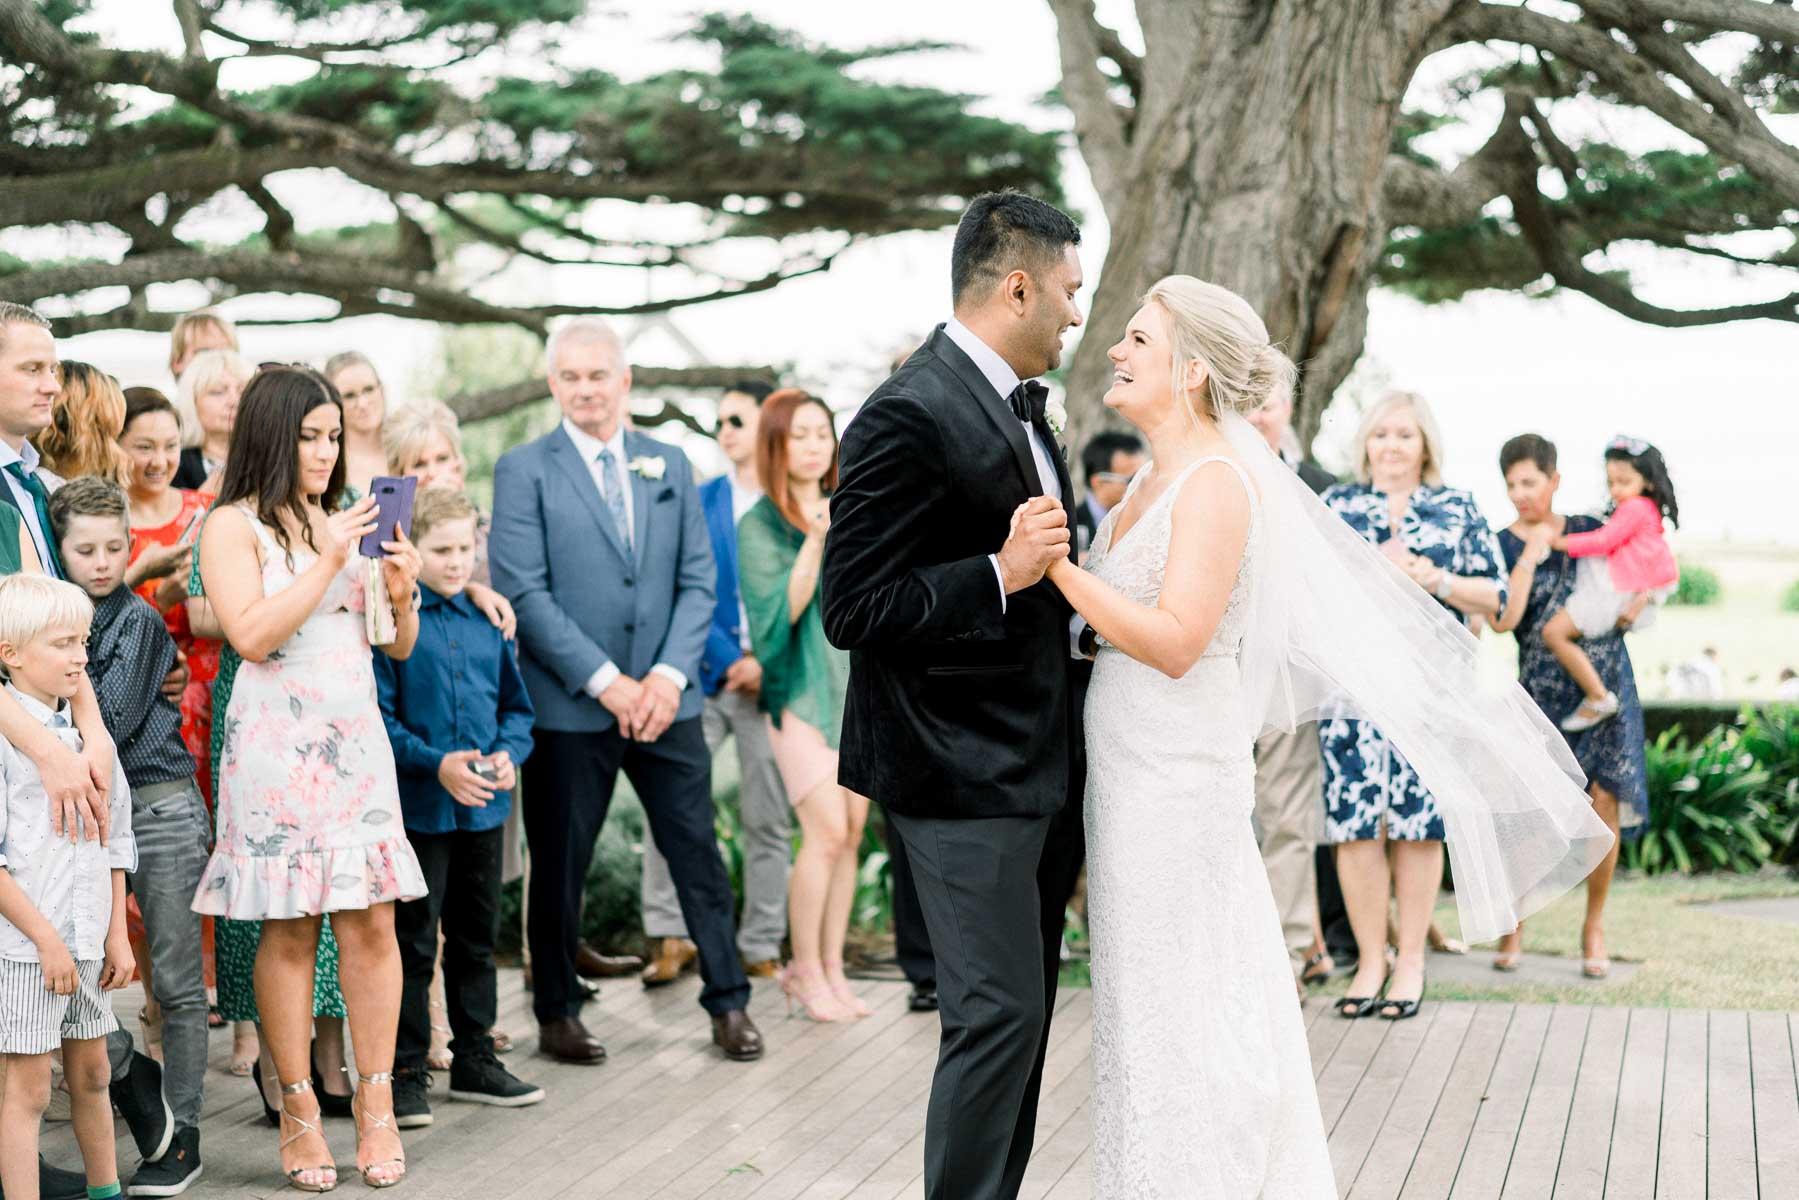 trenavin-chapel-phillip-island-wedding-heart+soul-weddings-sally-sean-00763.jpg